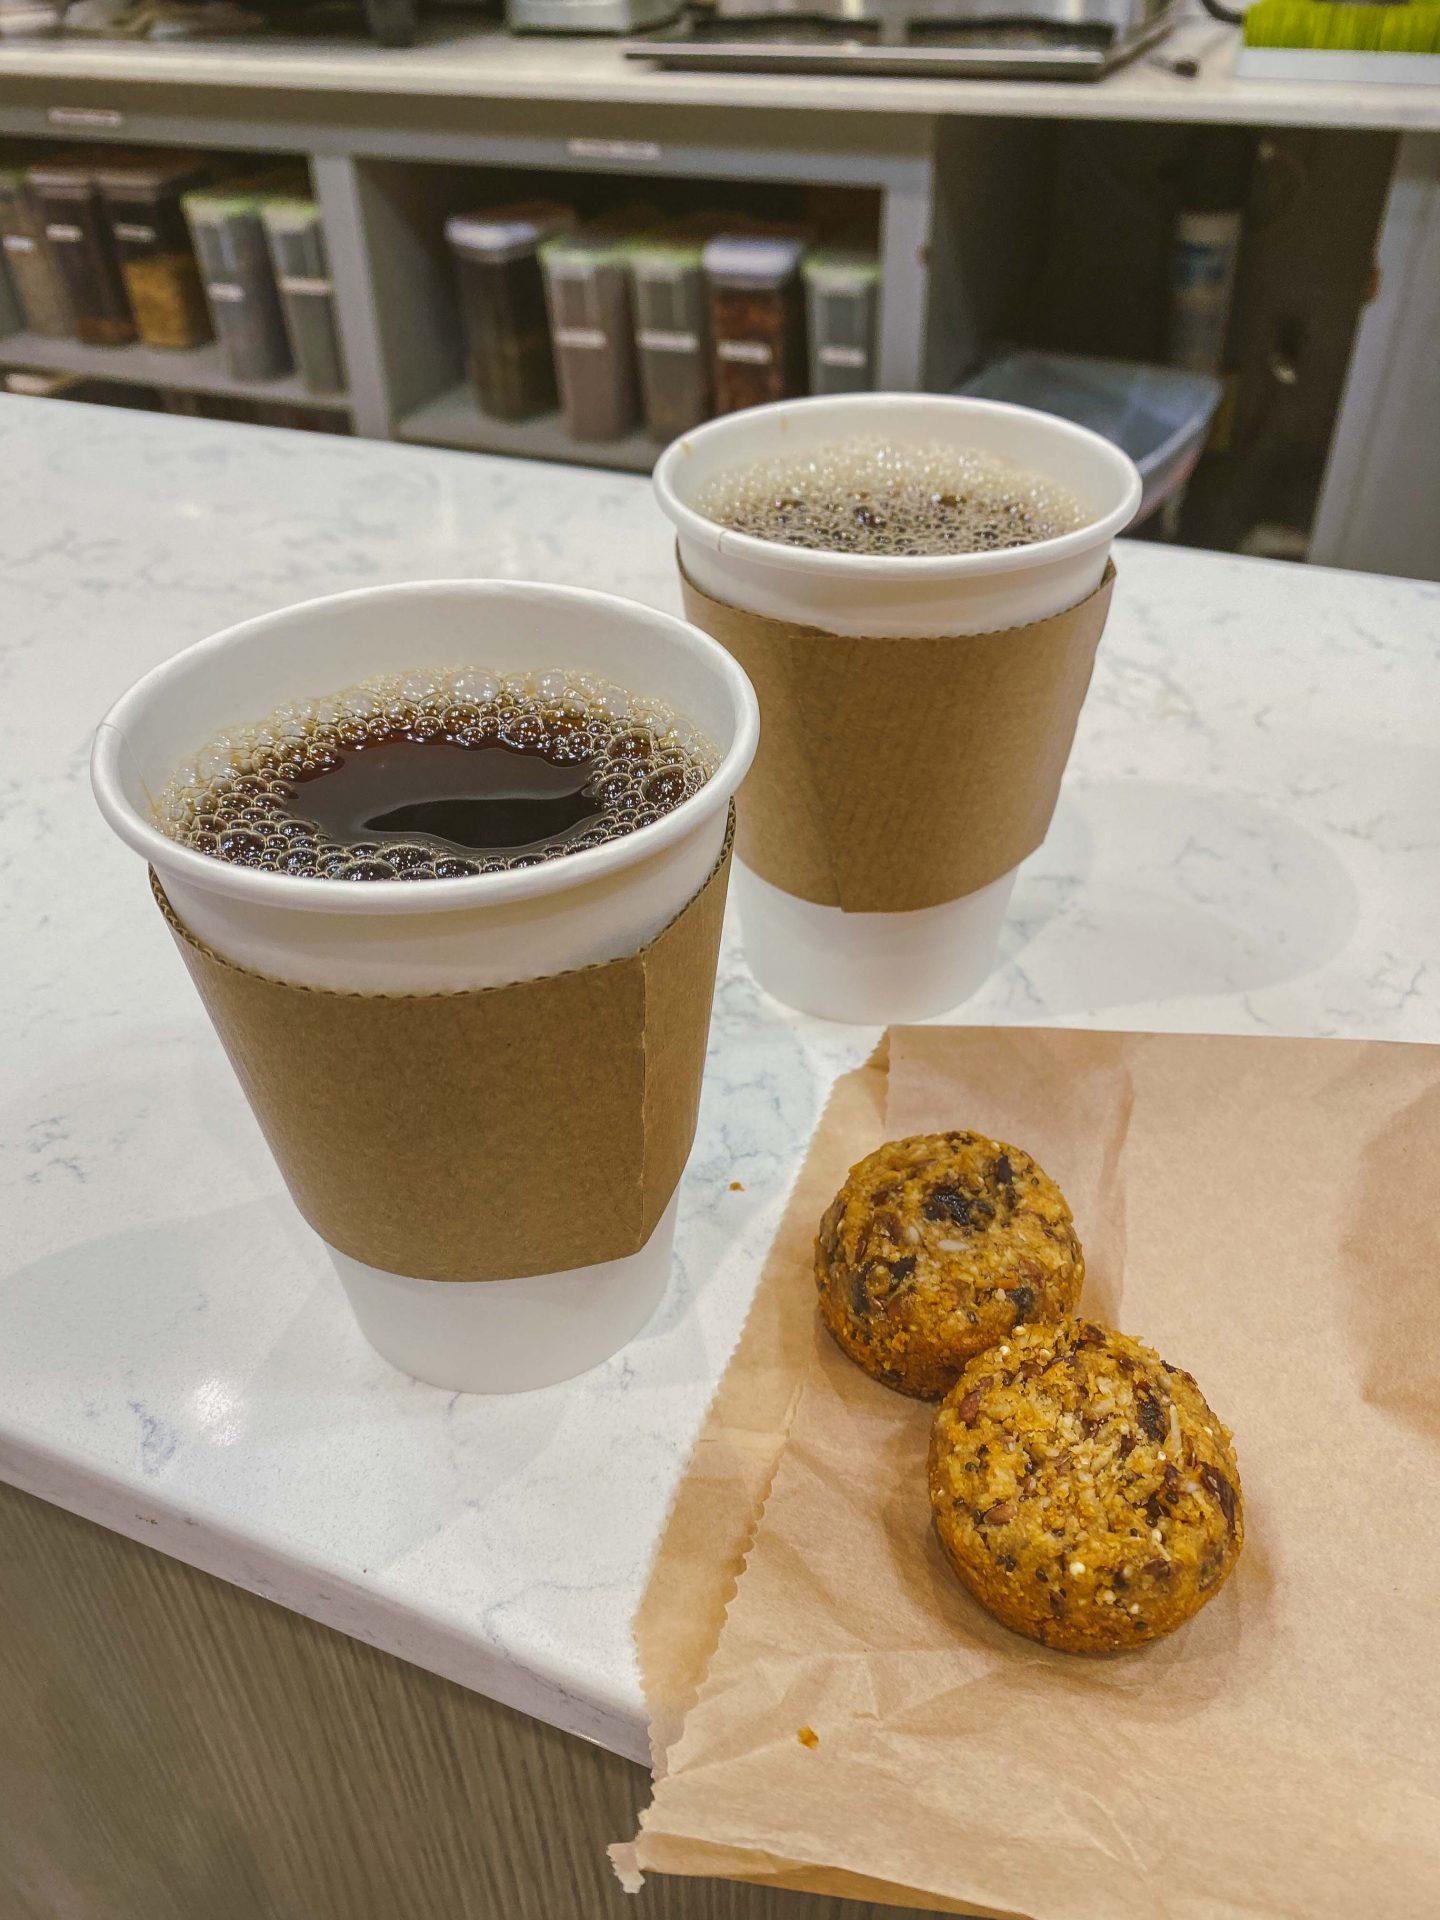 southwark mall, dillworth coffee